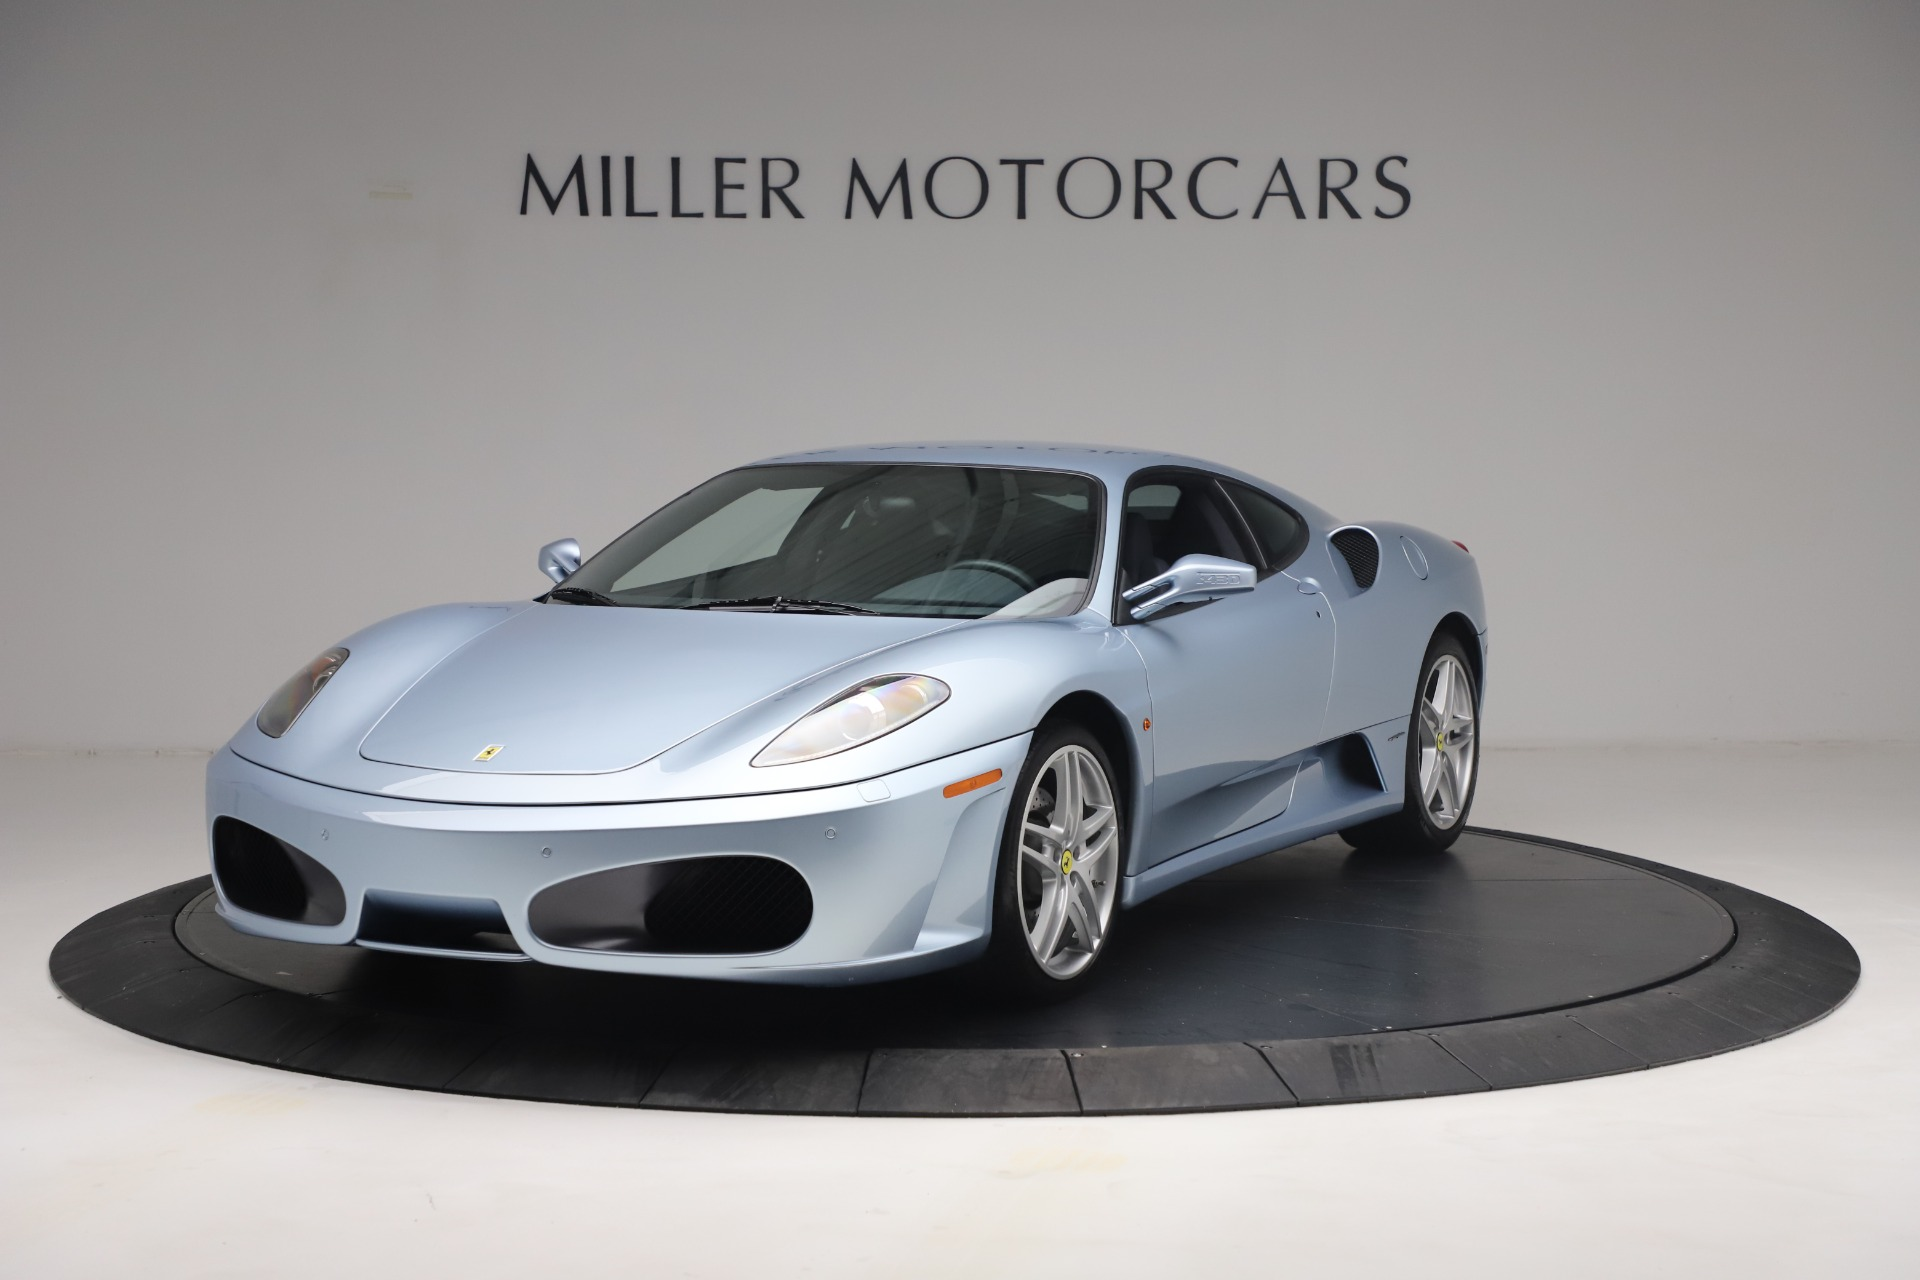 Used 2007 Ferrari F430 for sale $149,900 at Pagani of Greenwich in Greenwich CT 06830 1